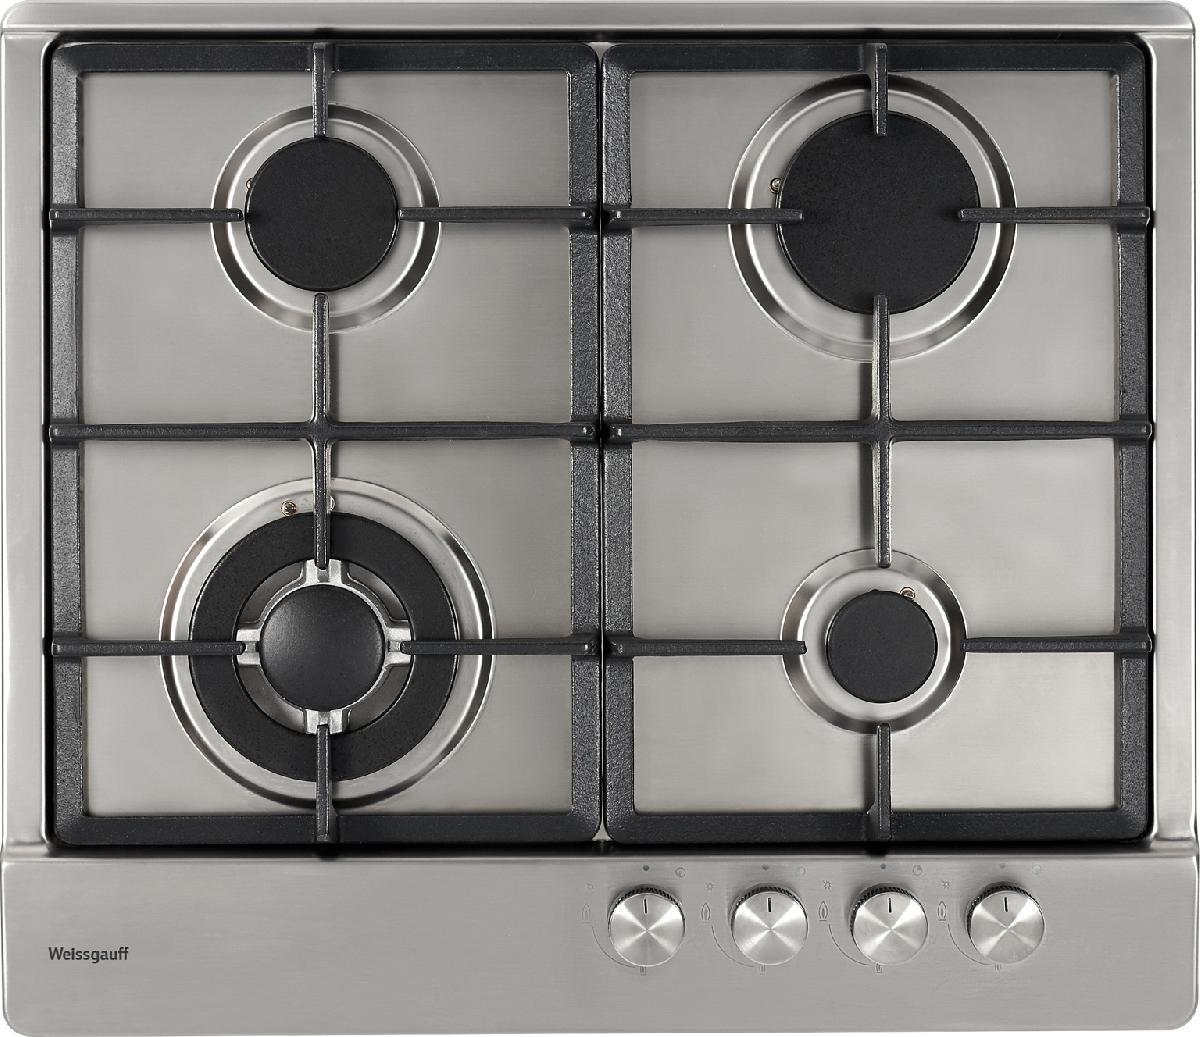 Посудомоечная машина Miele G 4700 SCi